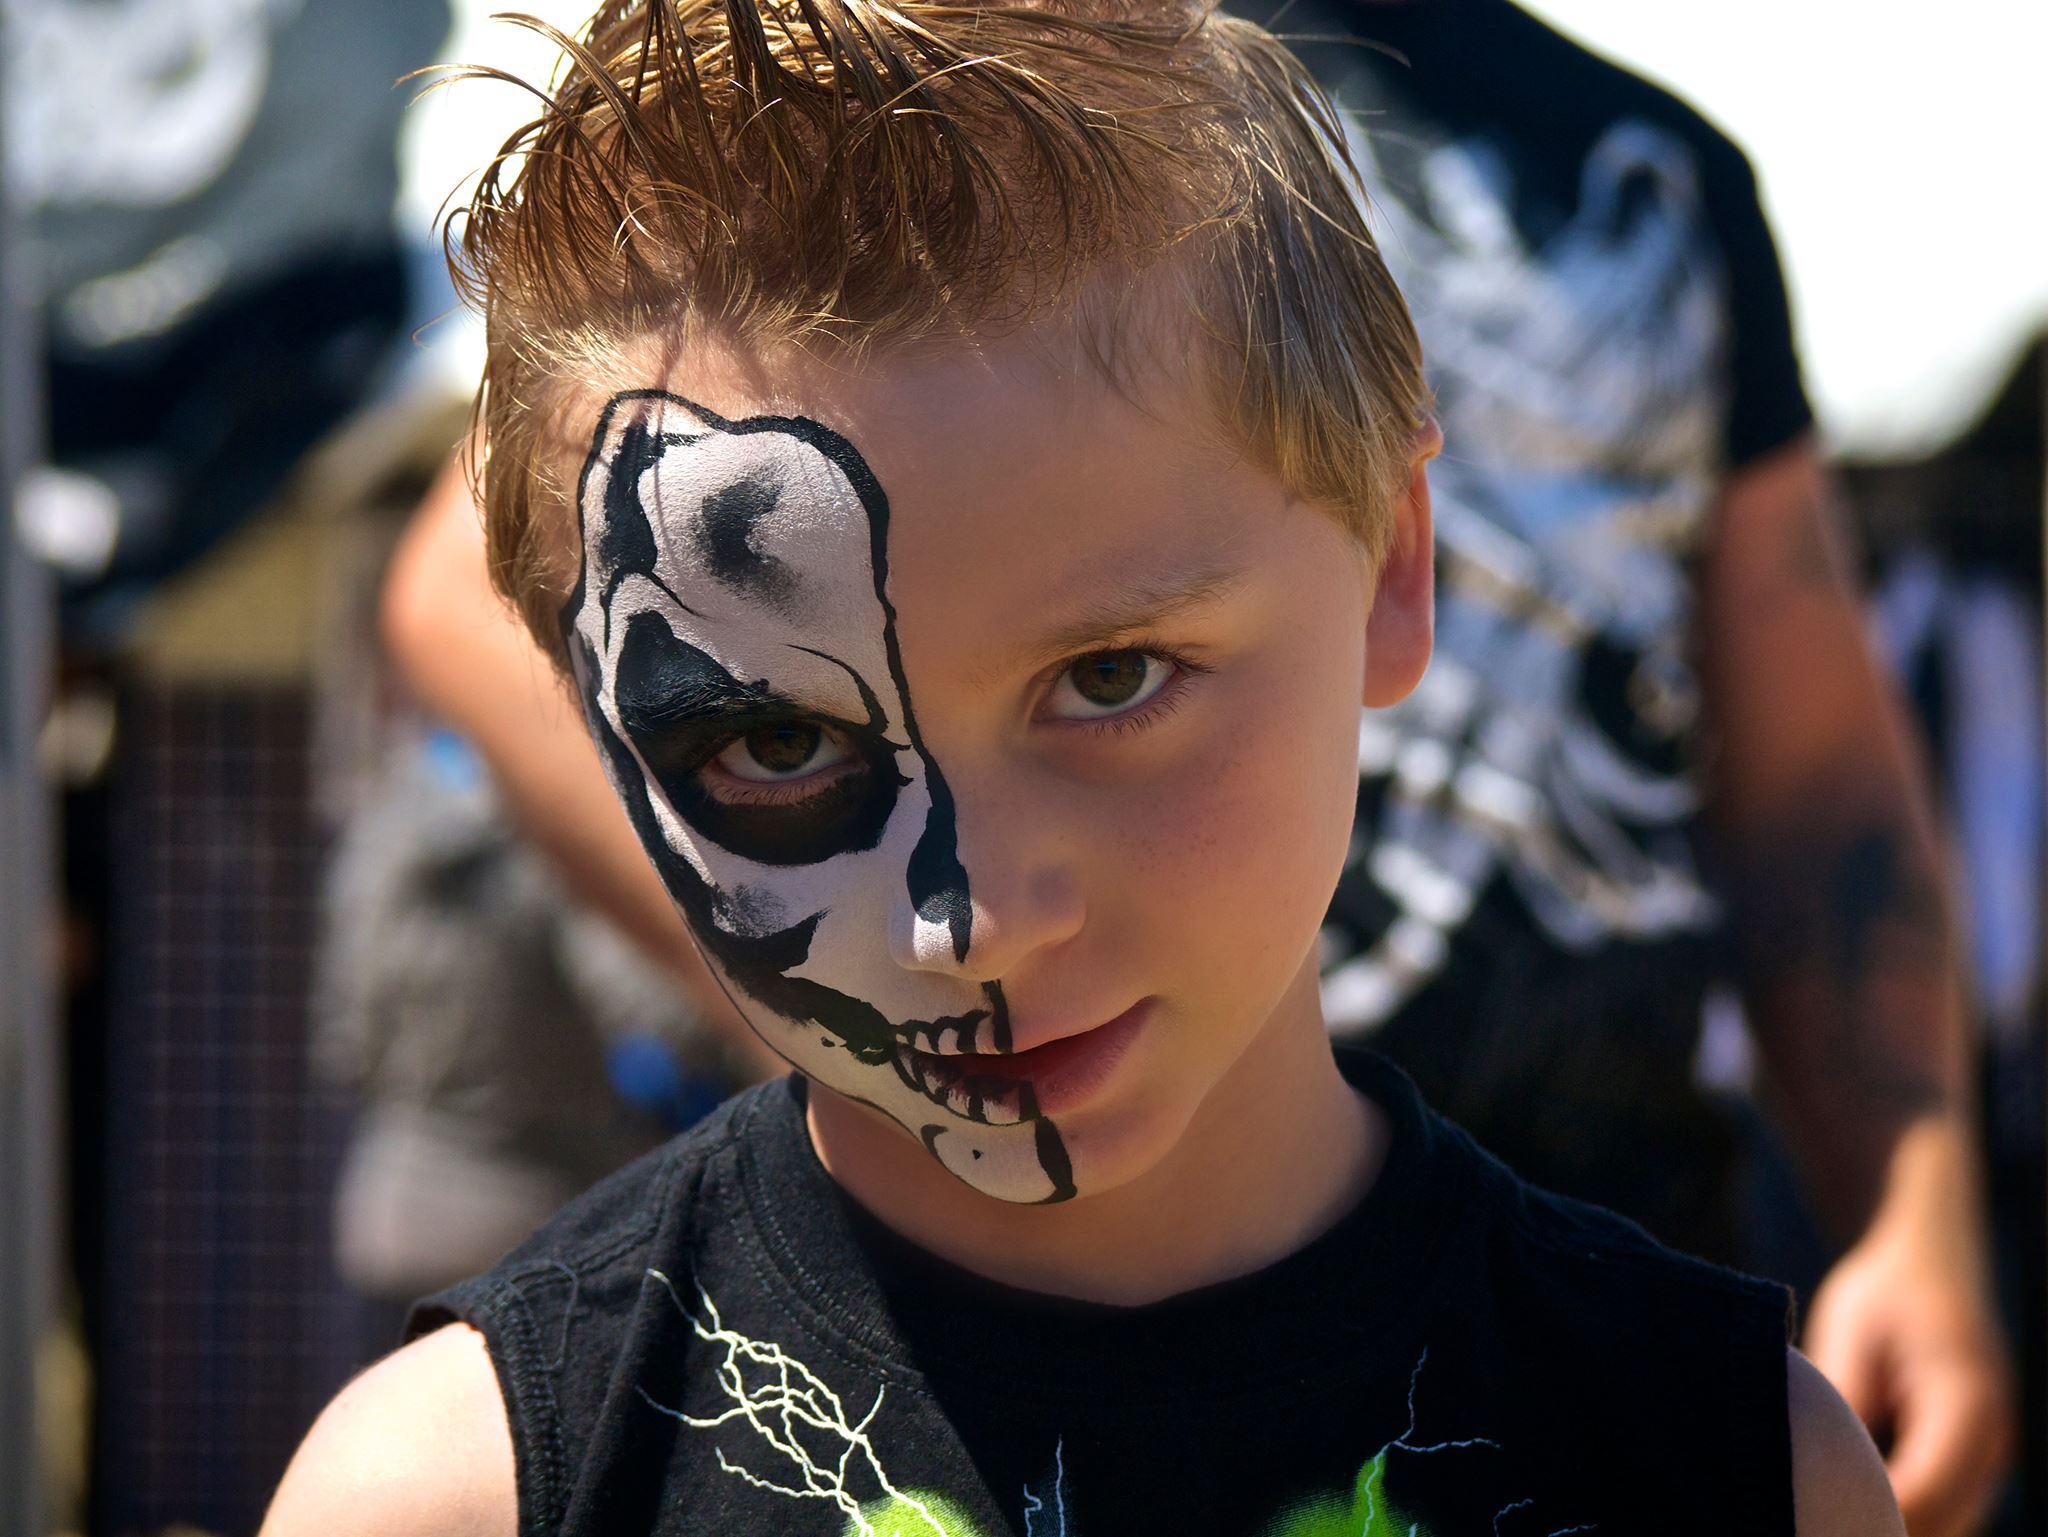 Jacob @ Pirate Fest